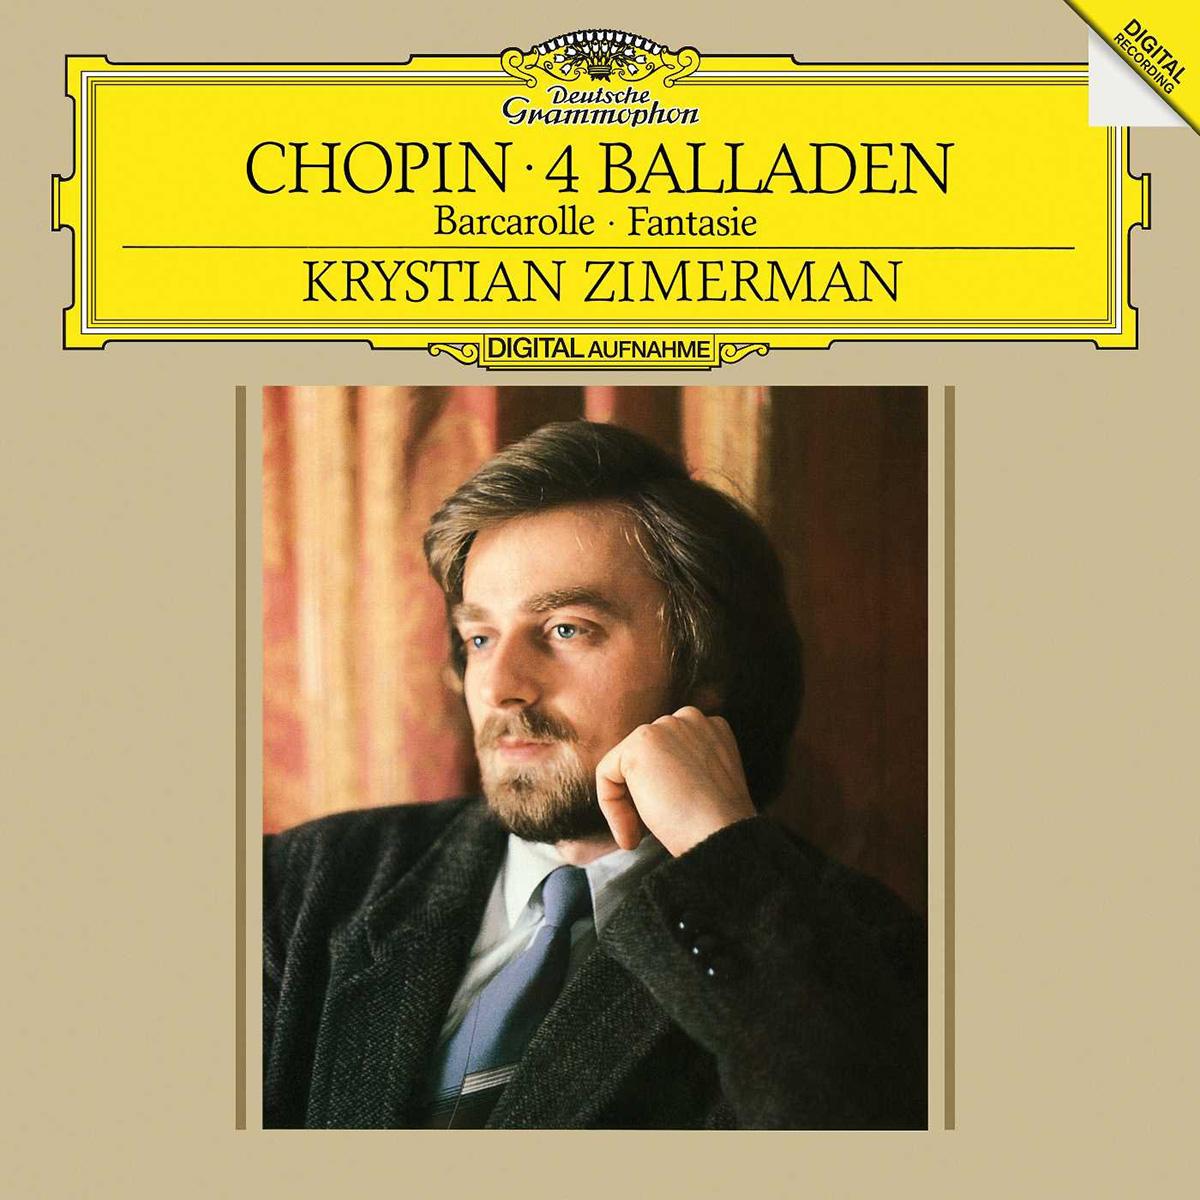 DGG 423 090 Chopin Ballades Barcarolle Fantaisie Zimerman DGG Digital Aufnahme